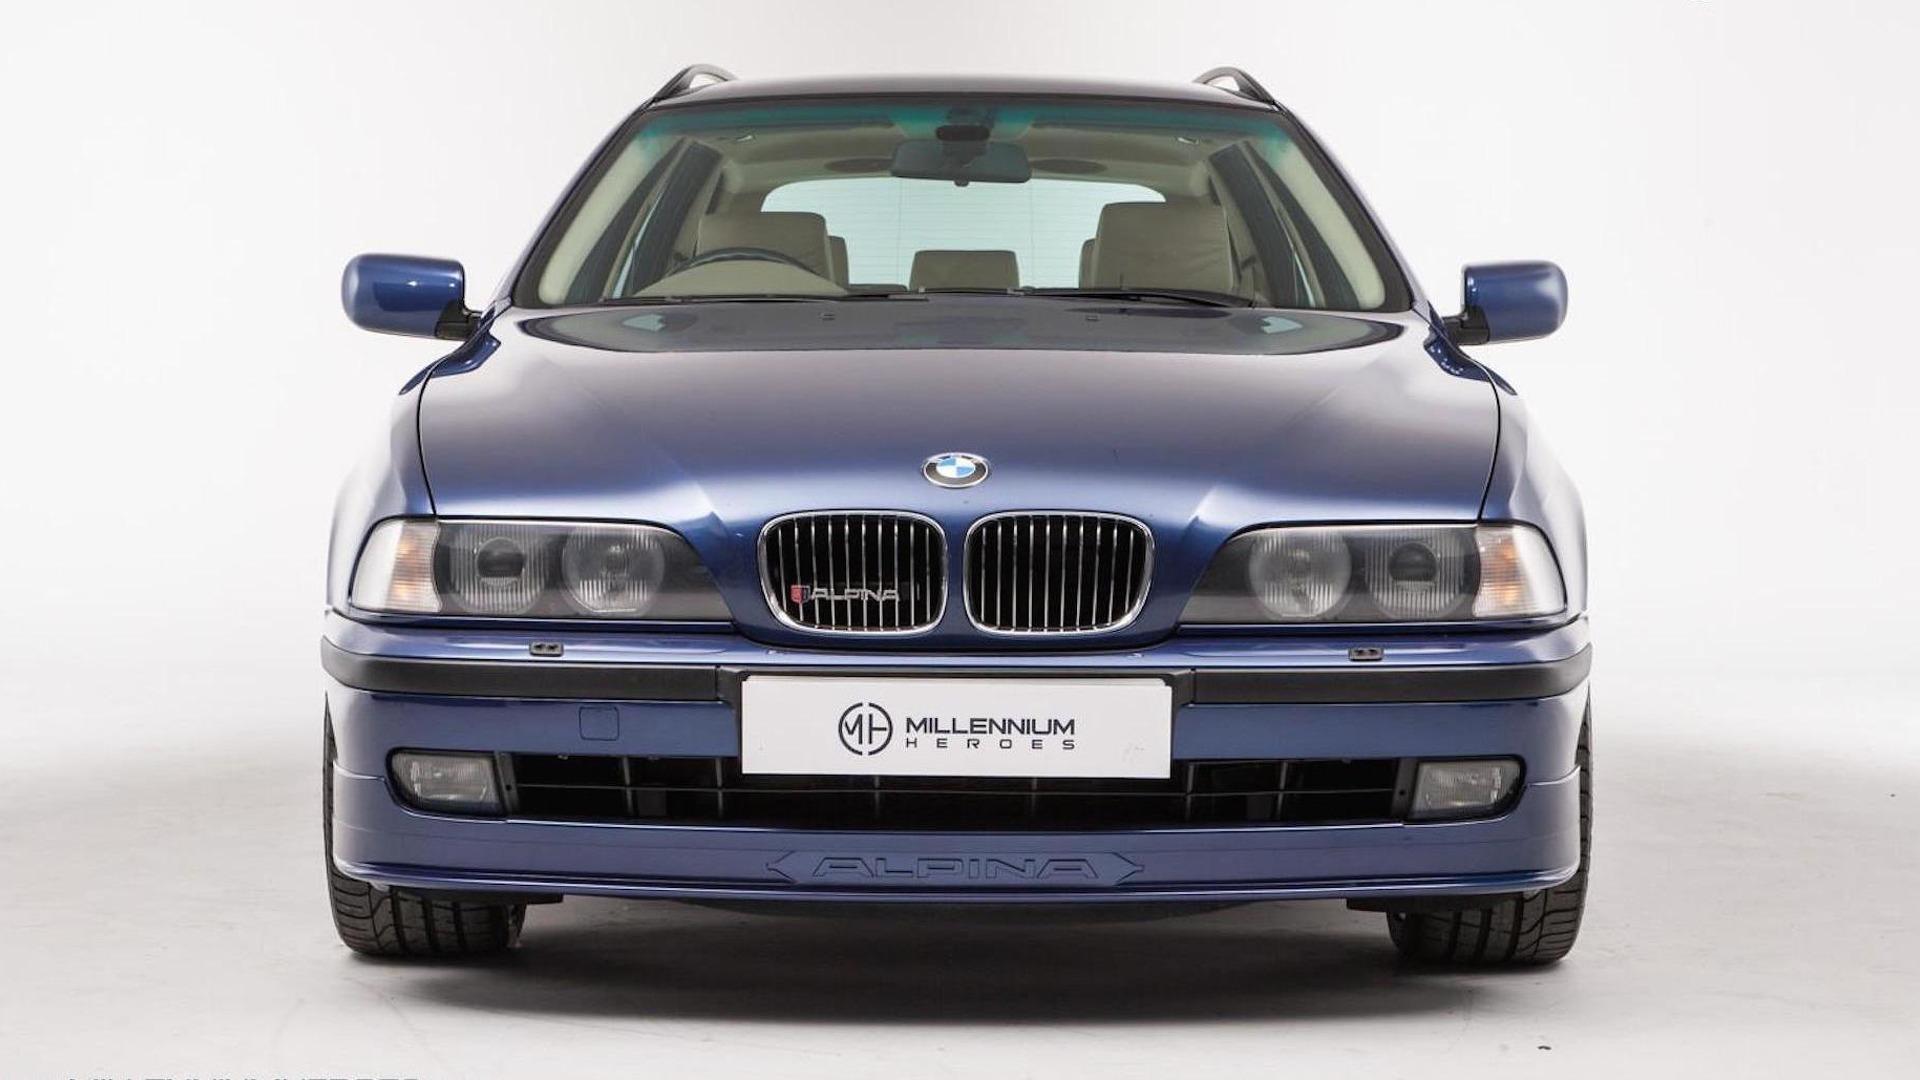 Rare Alpina Tuned Bmw 5 Series Wagon Is A Bargain At 18 995